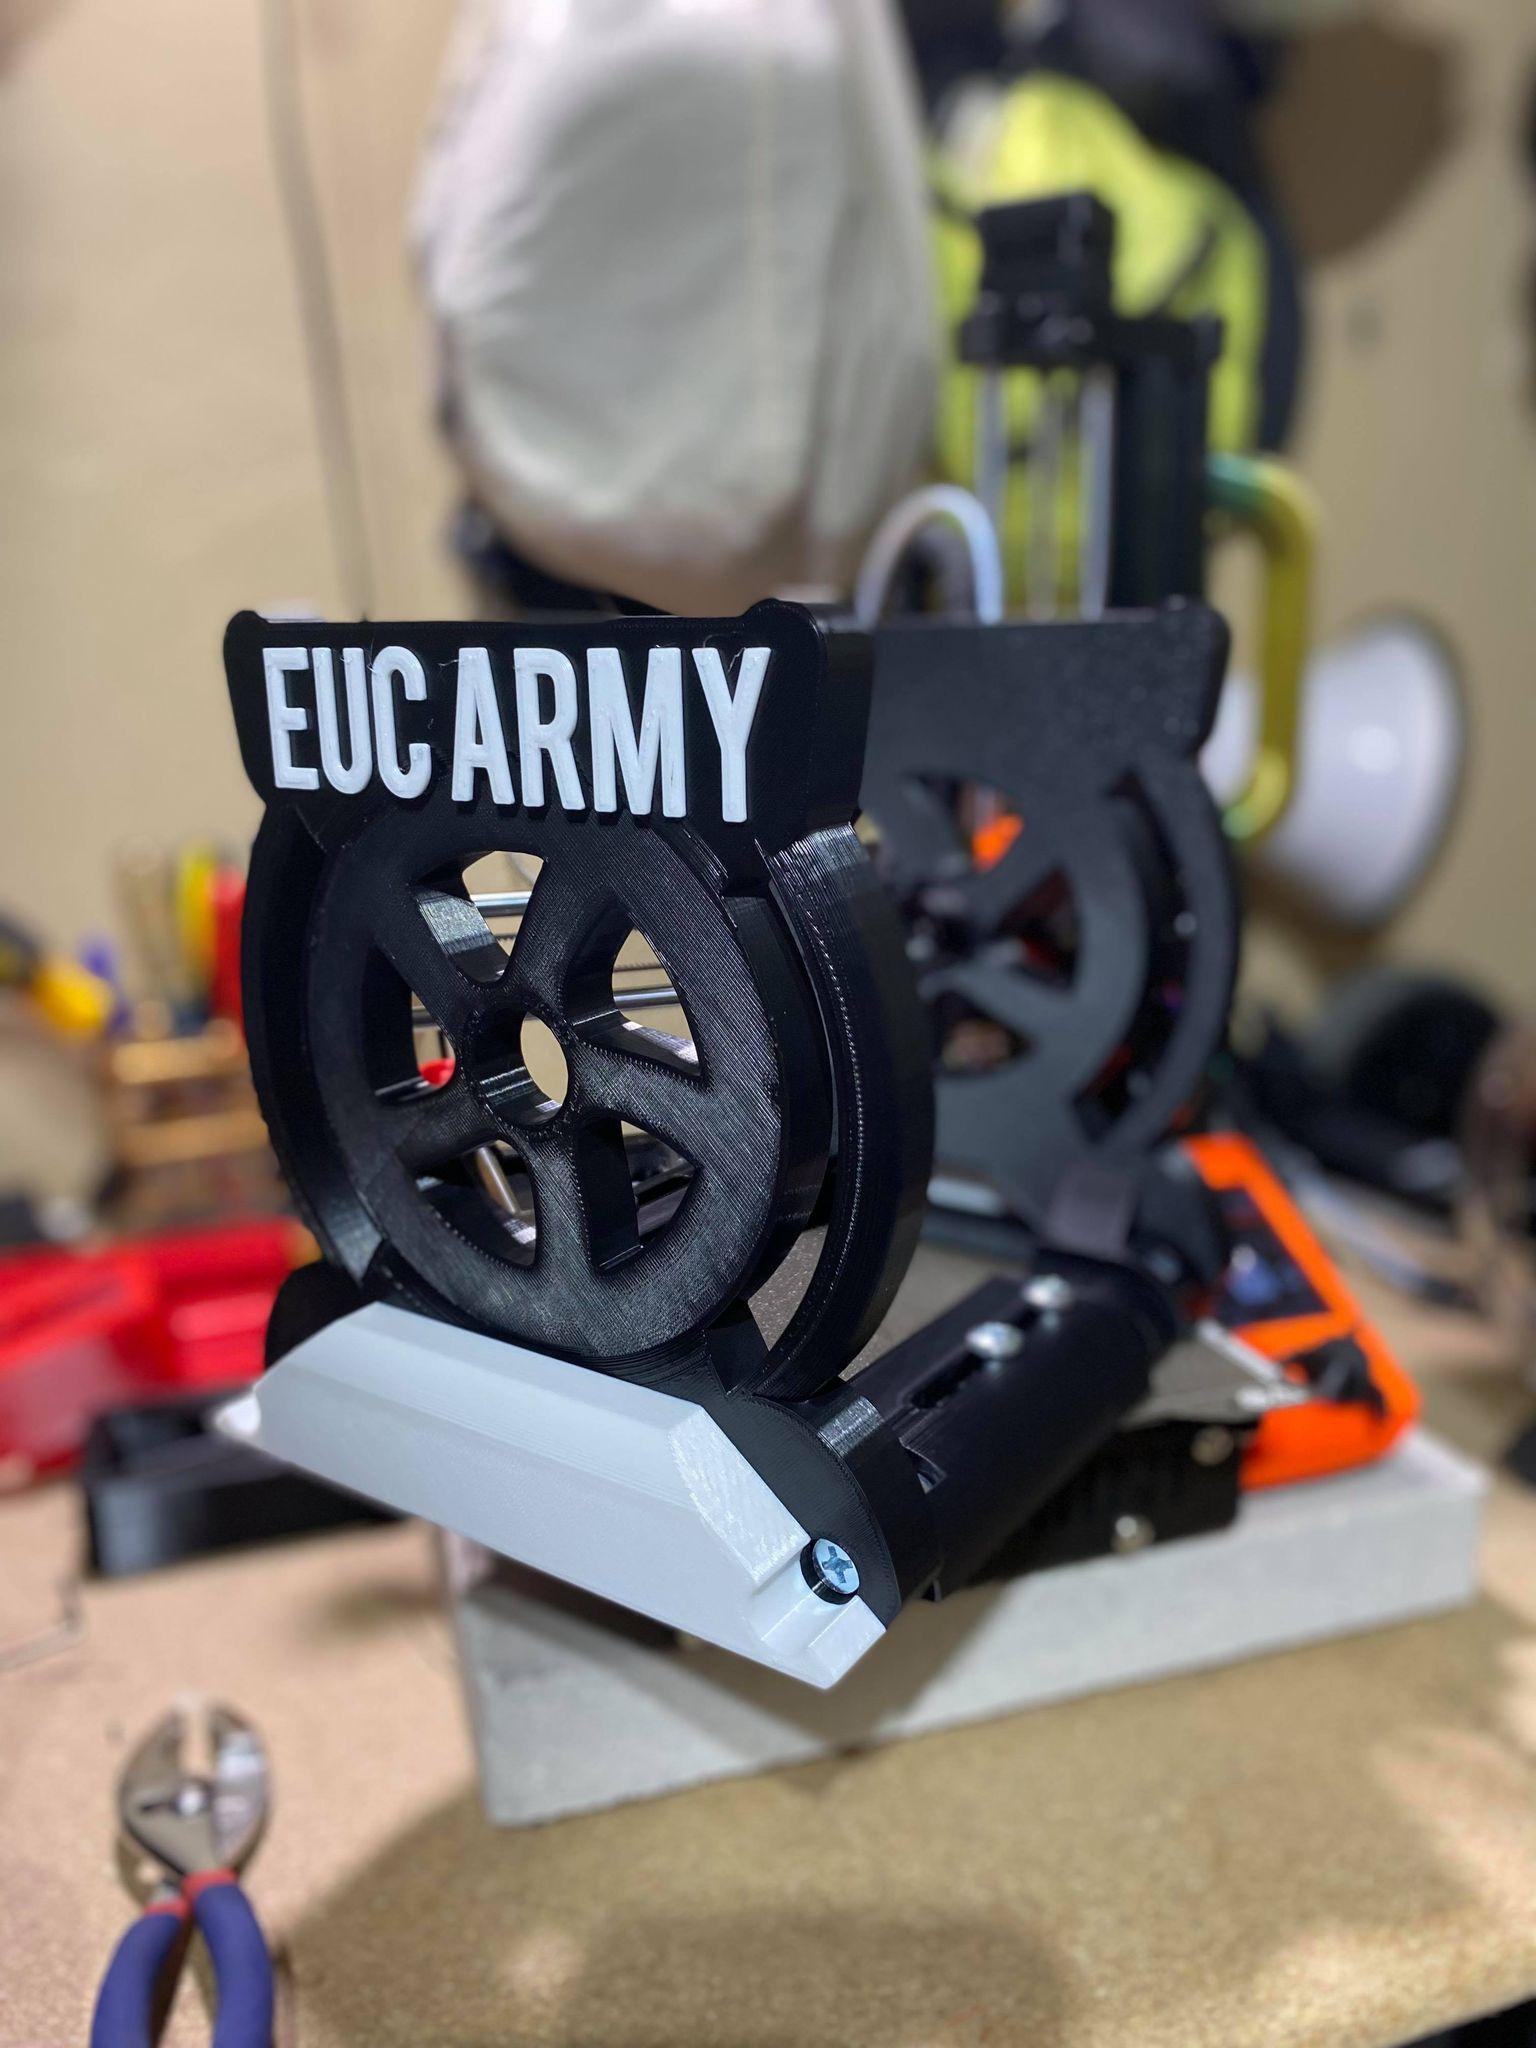 EUC Stand 3.9 XS Premium Adjustable